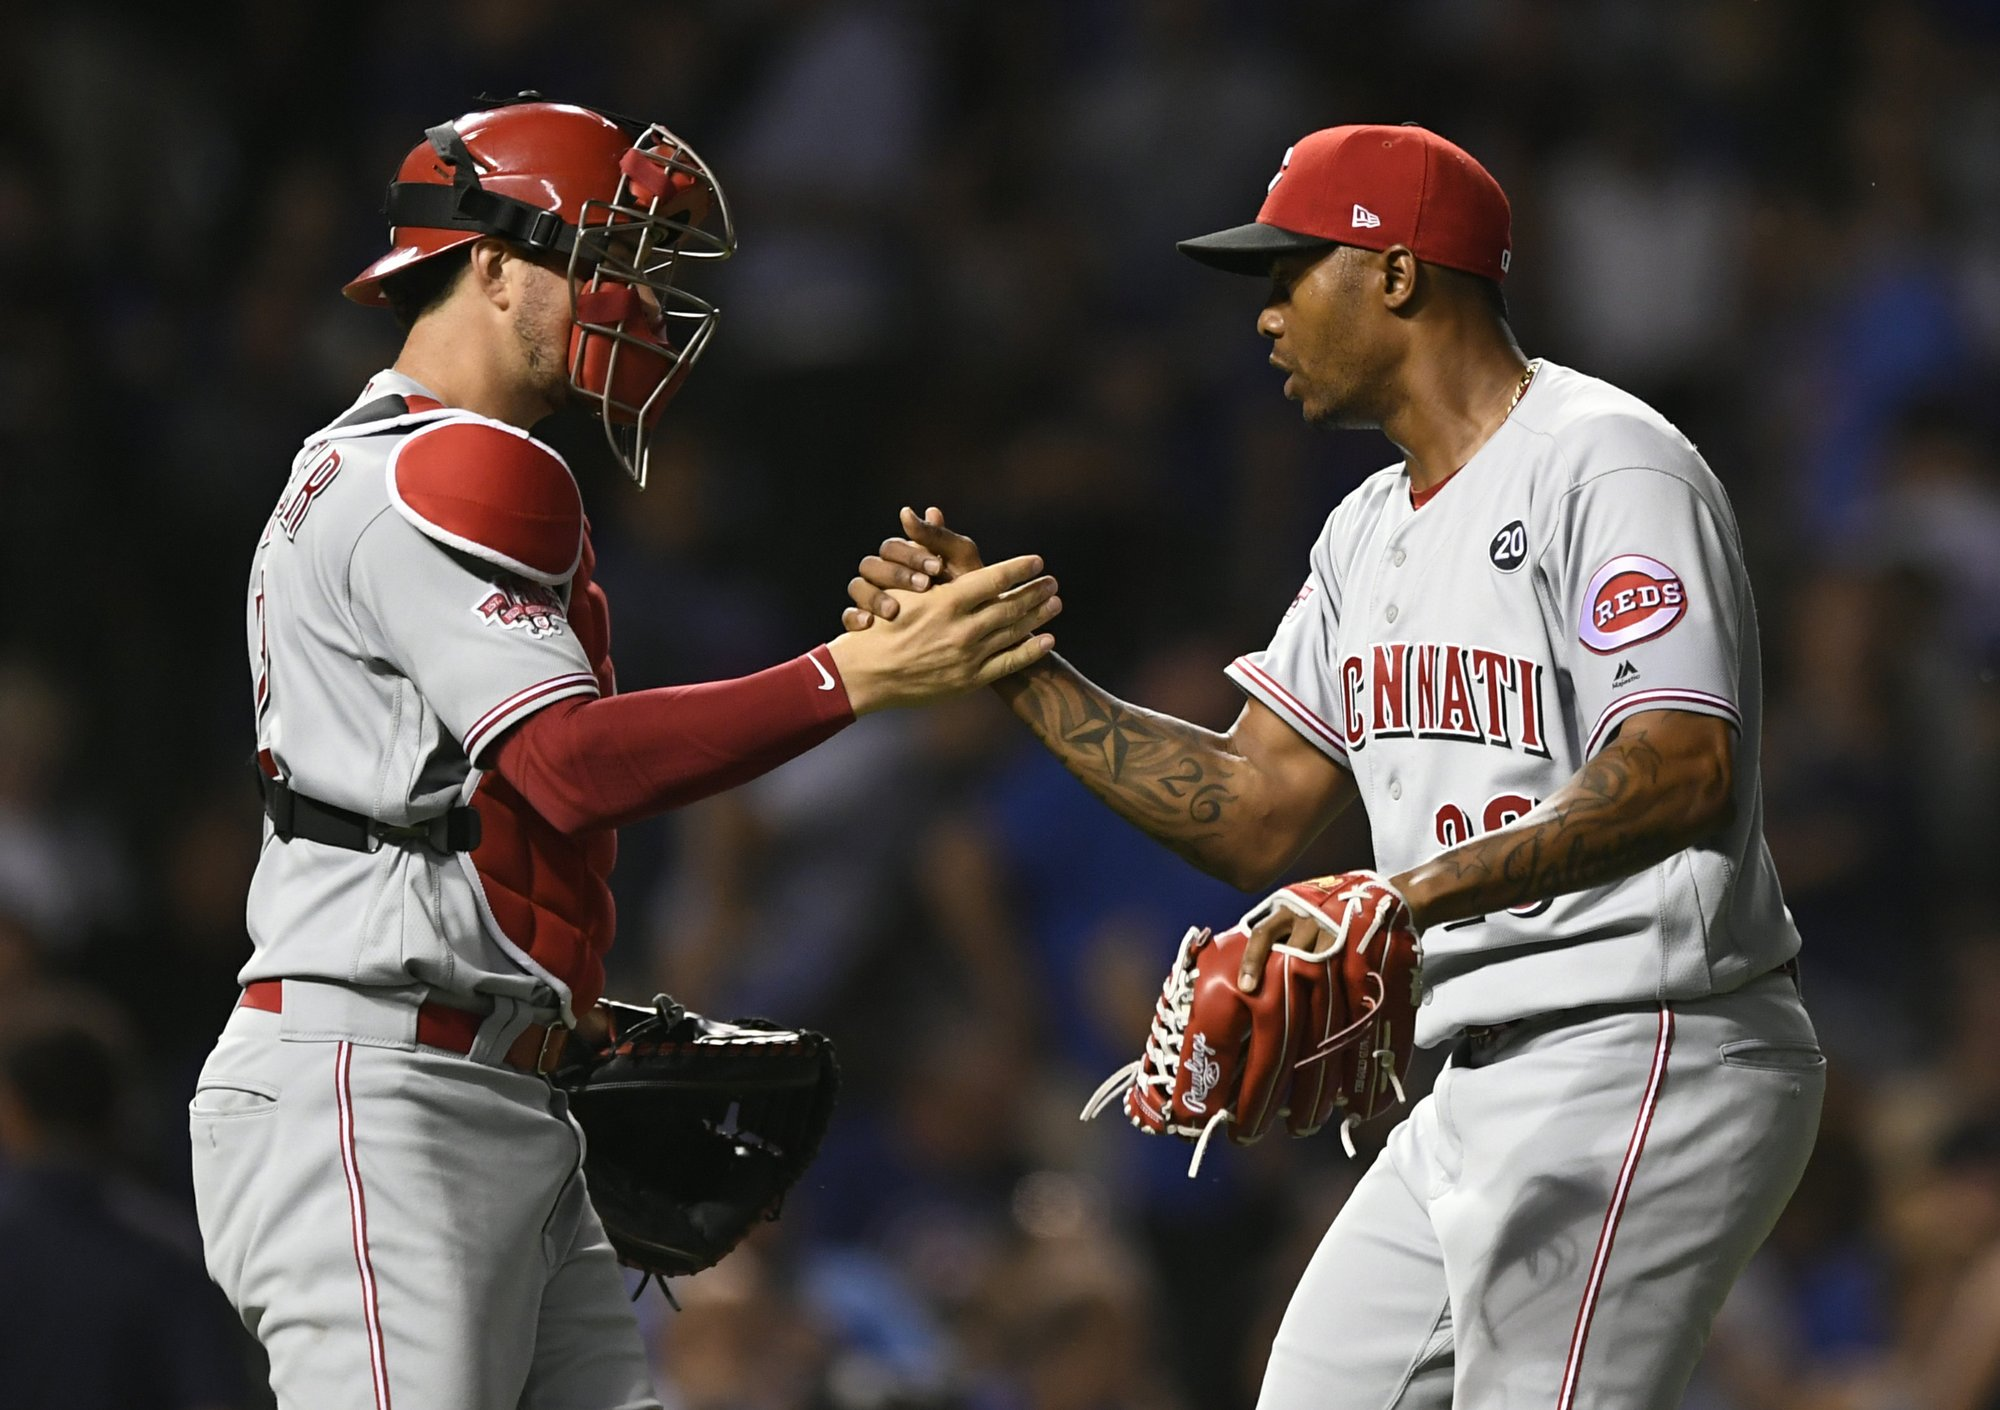 Suárez, Puig homer, Reds jump on Cubs errors to win 6-3